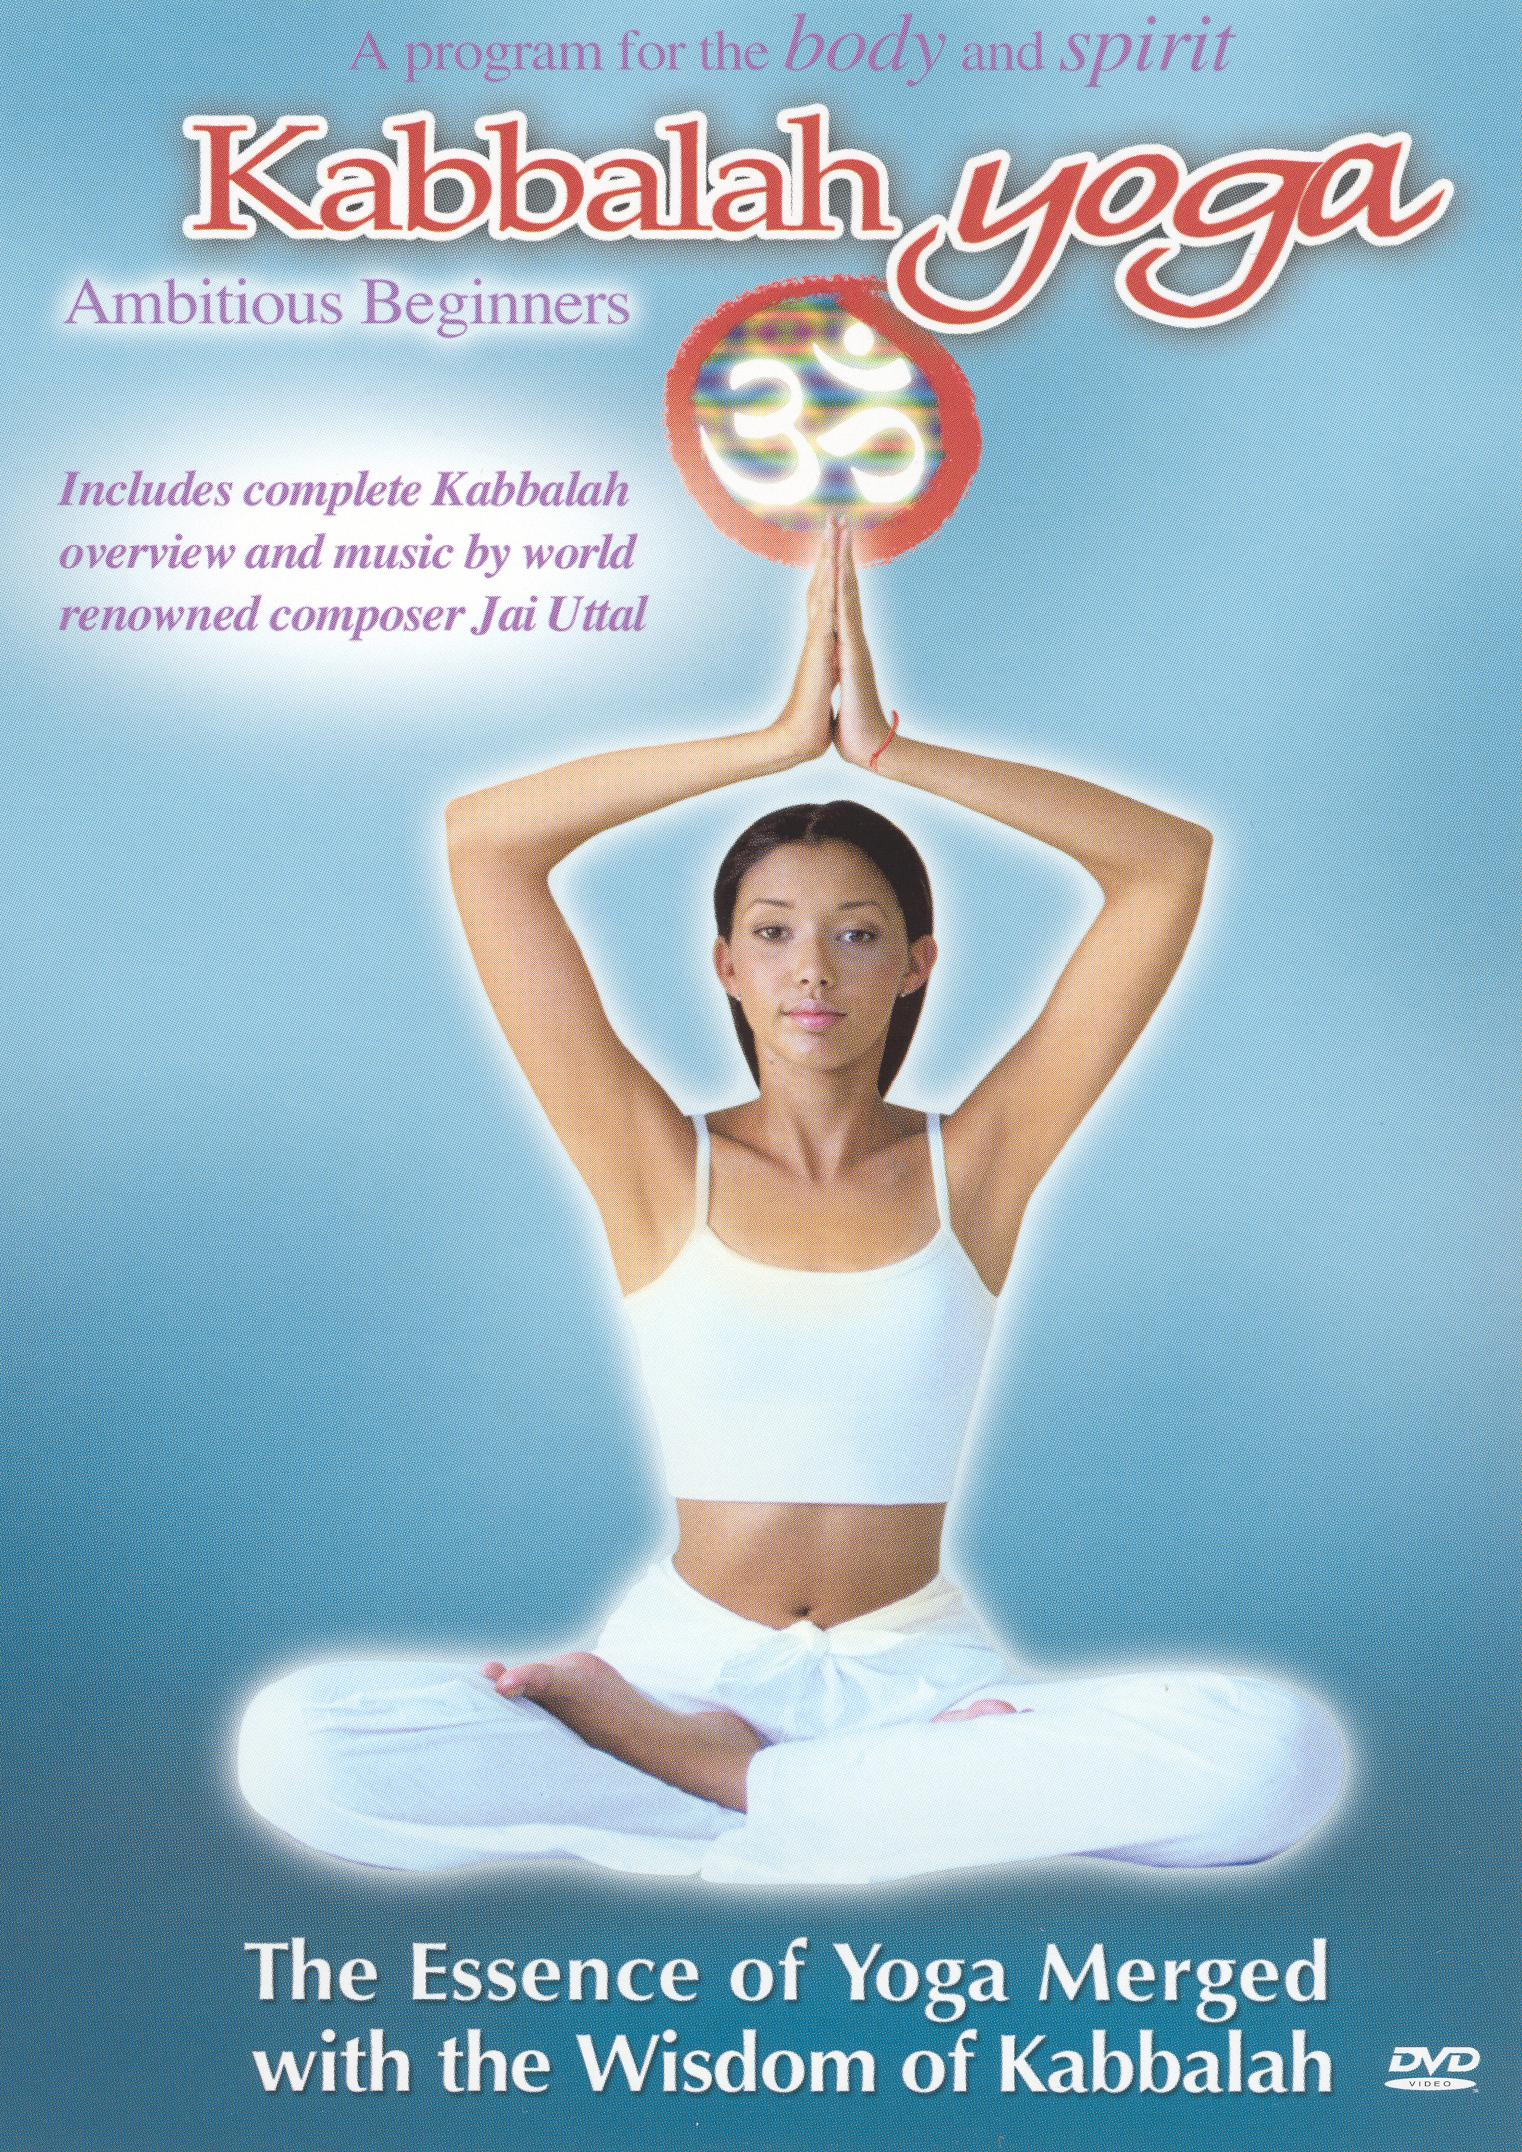 Kabbalah Yoga: Ambitious Beginners